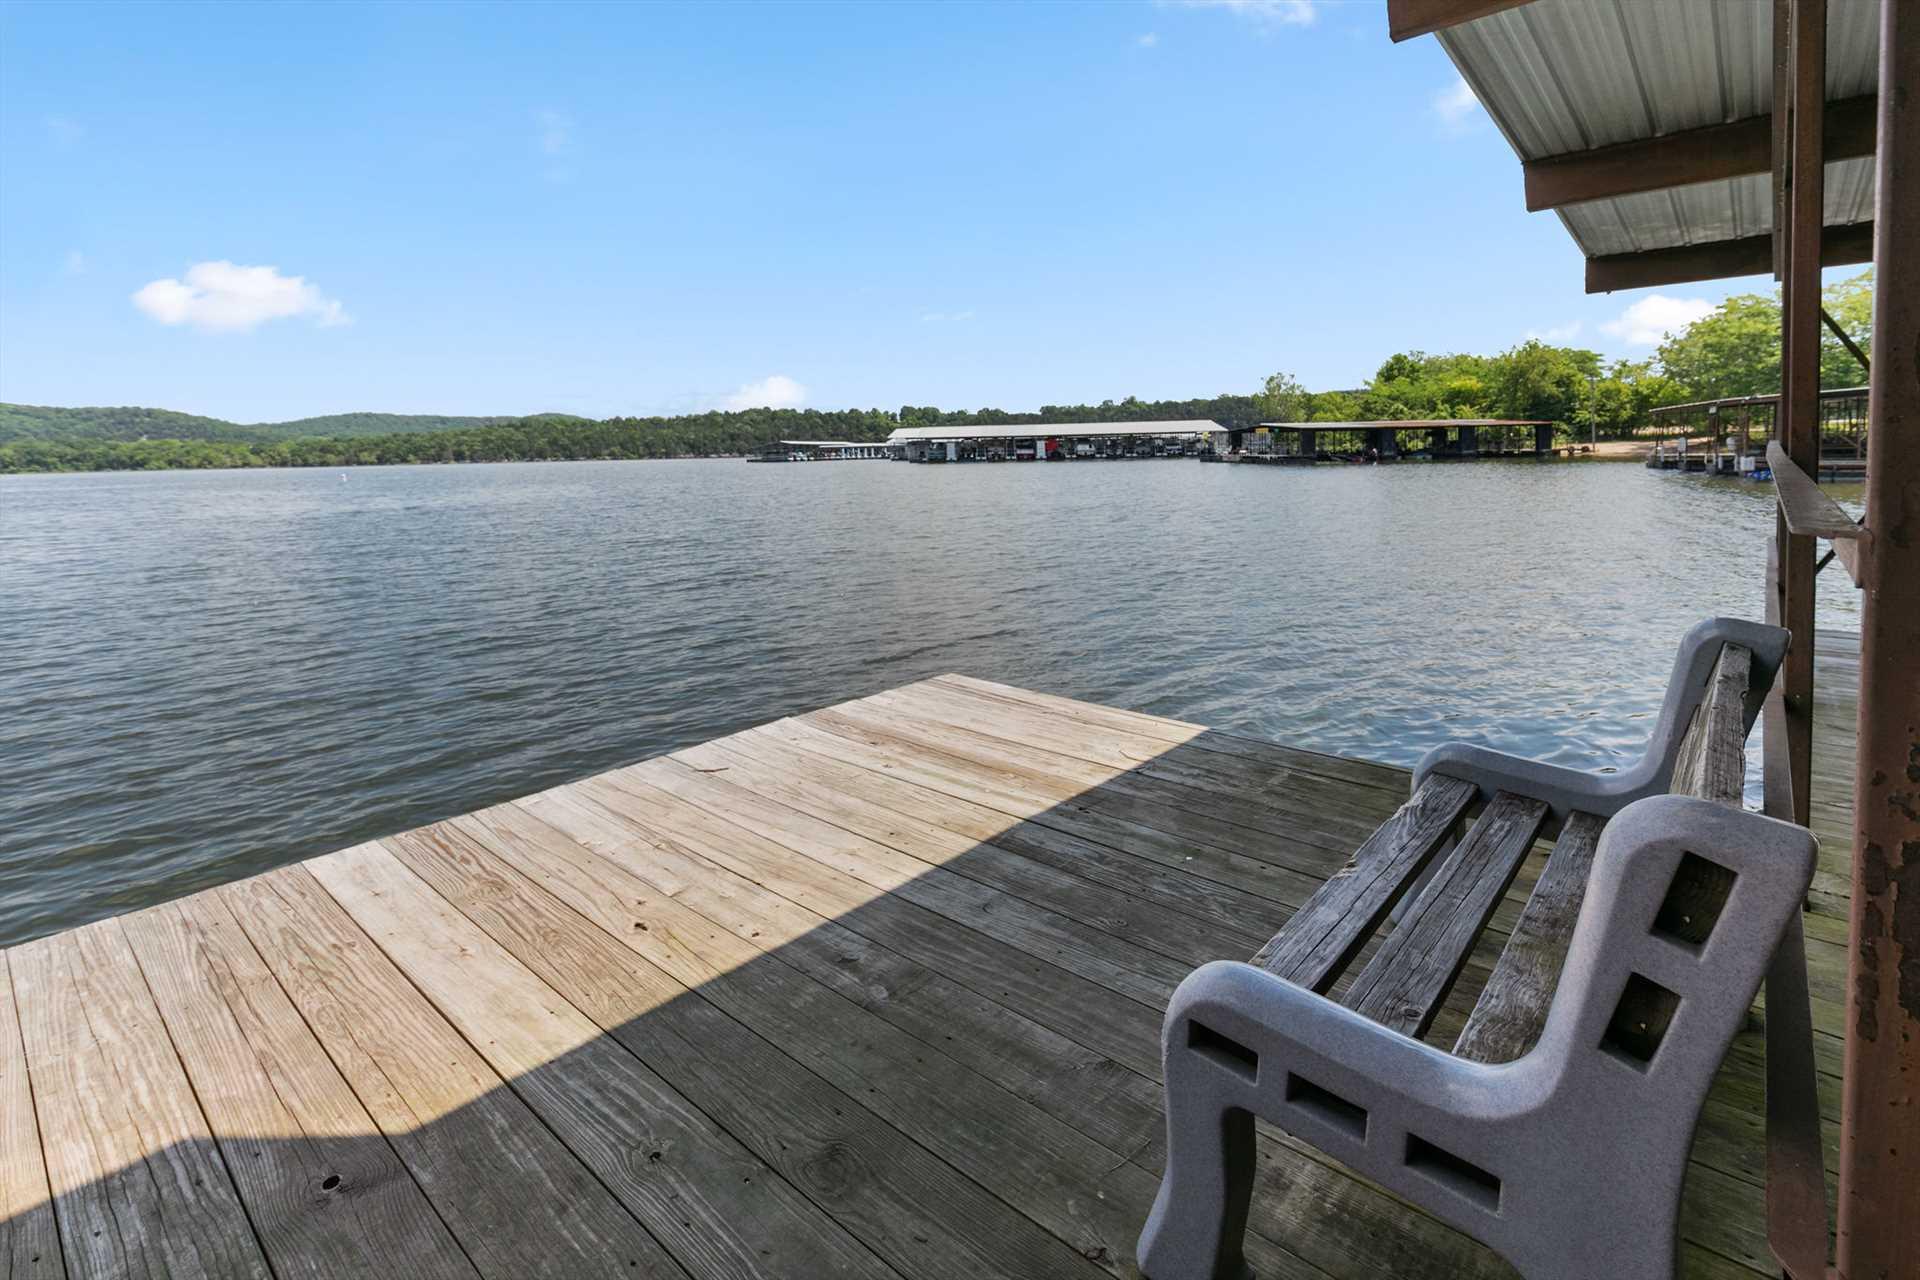 Sun bathe or swim off the dock in the quiet cove.